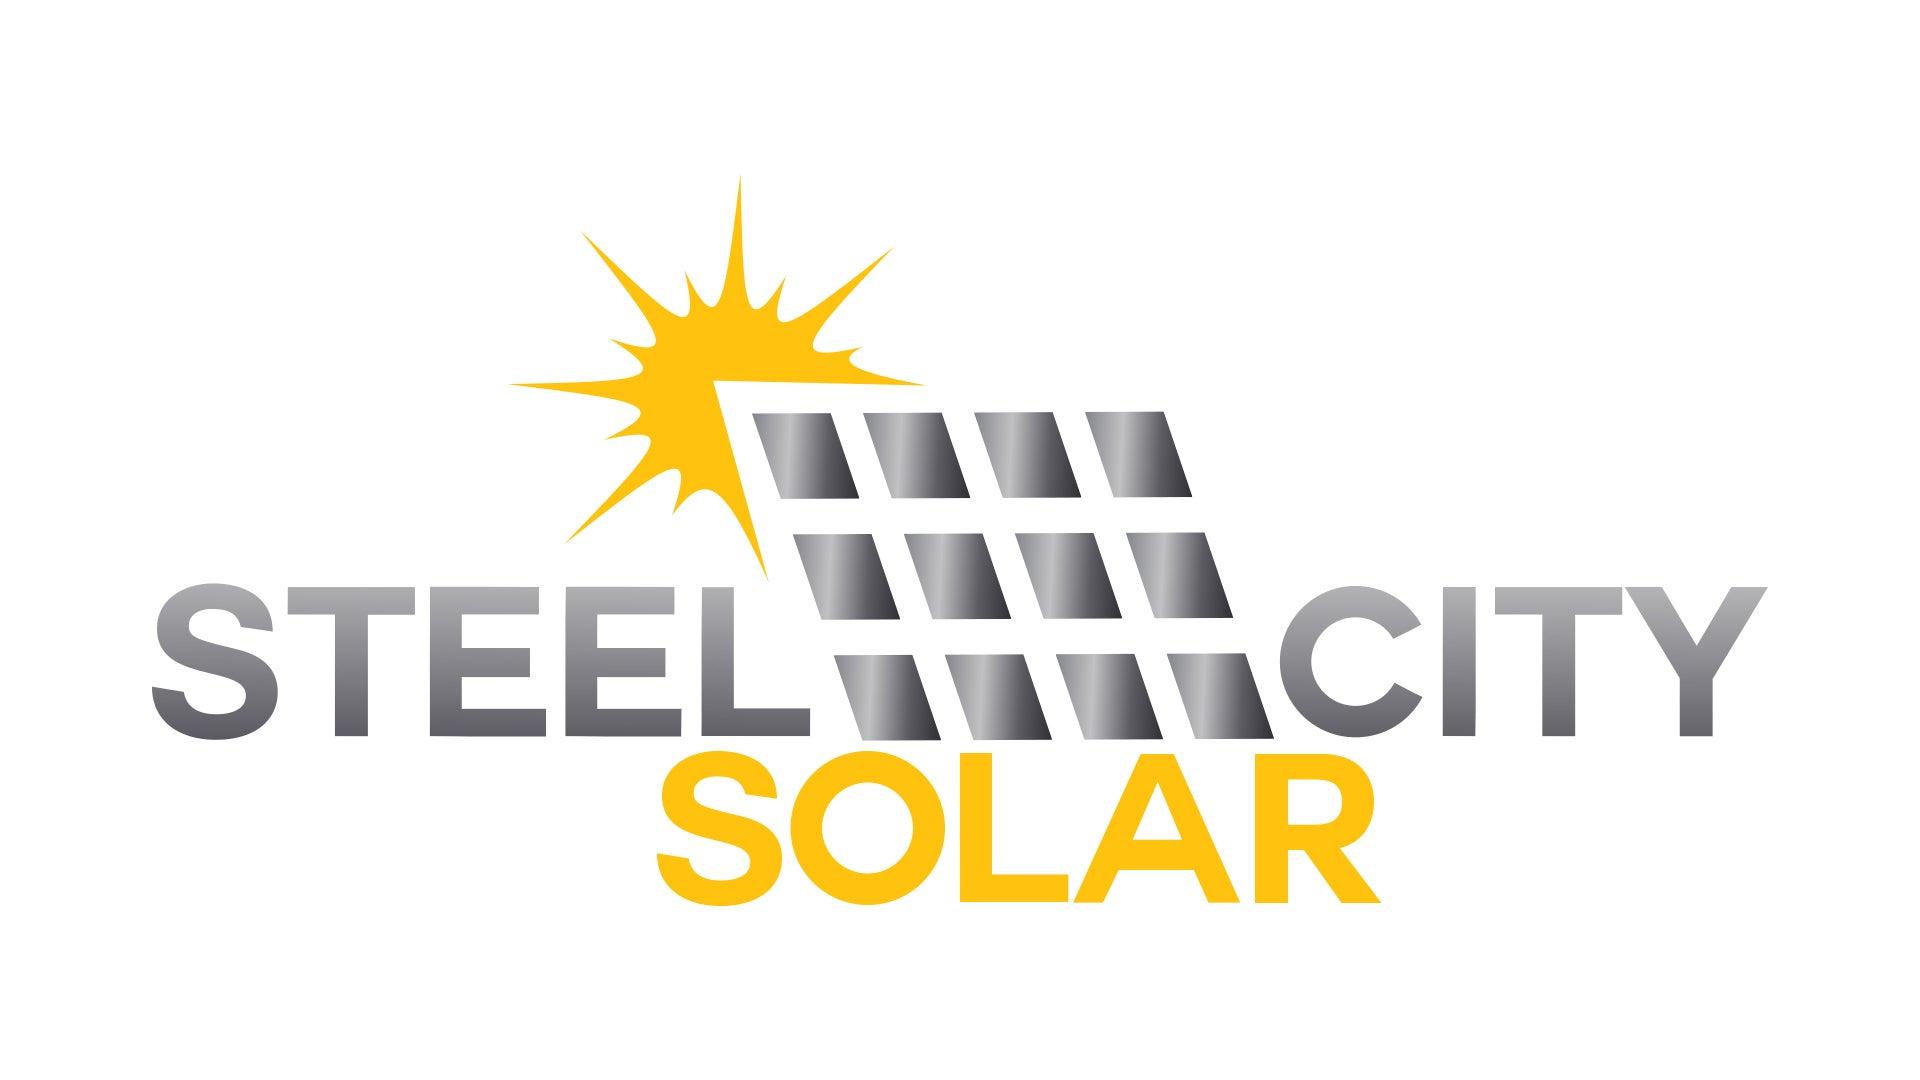 Steel City Solar